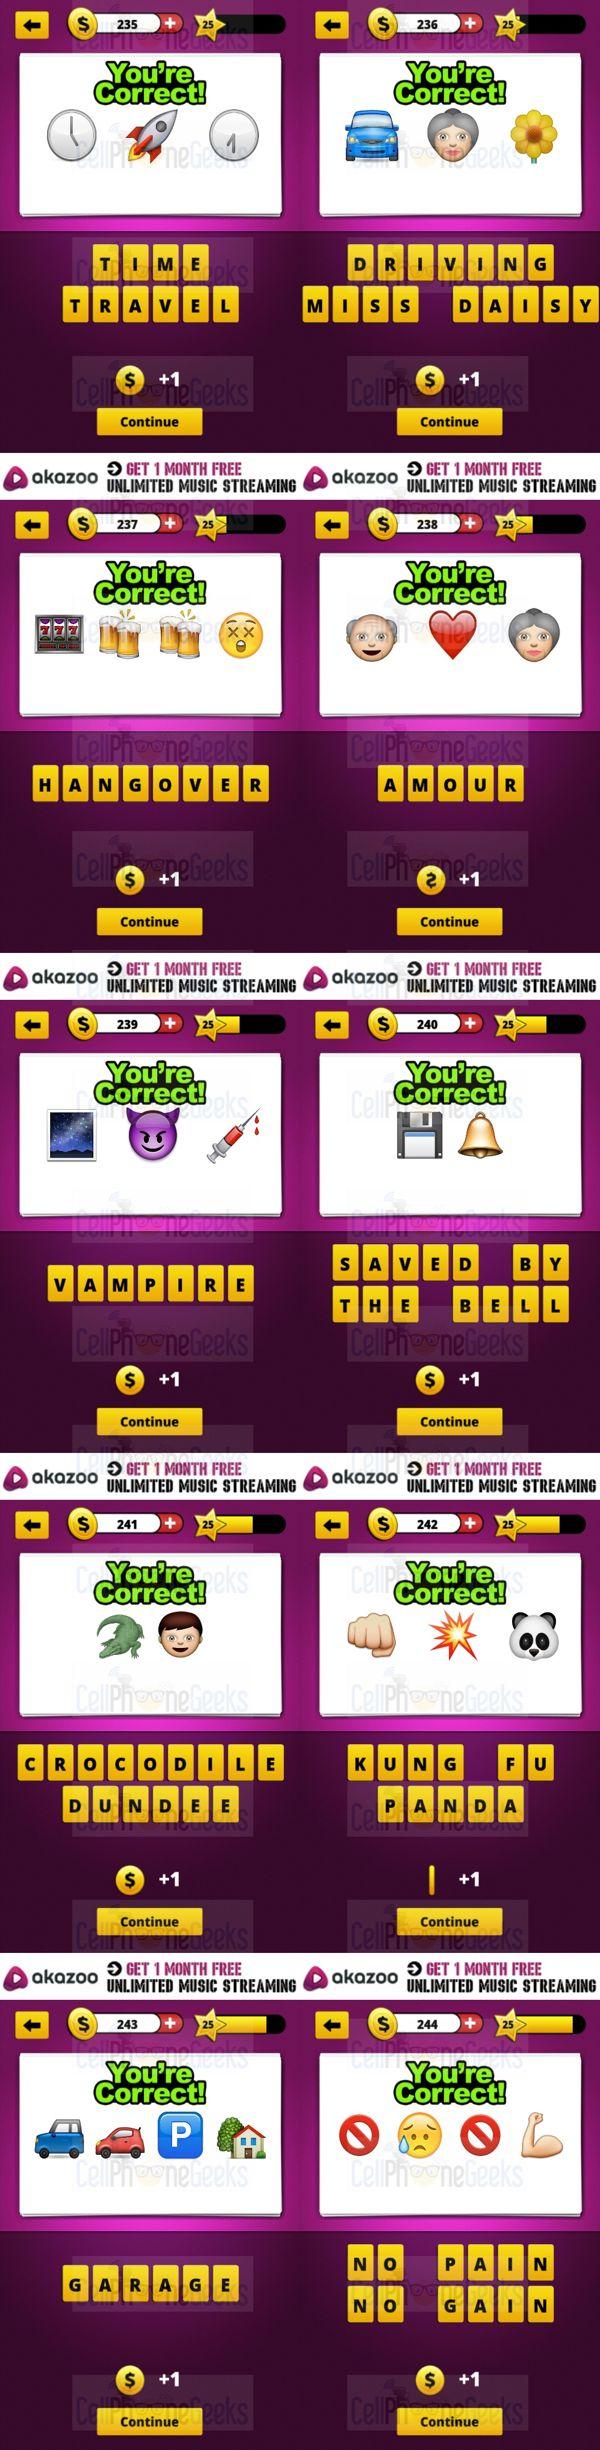 Guess The Emoji Answers Level 2 : guess, emoji, answers, level, Guess, Emoji, Answers